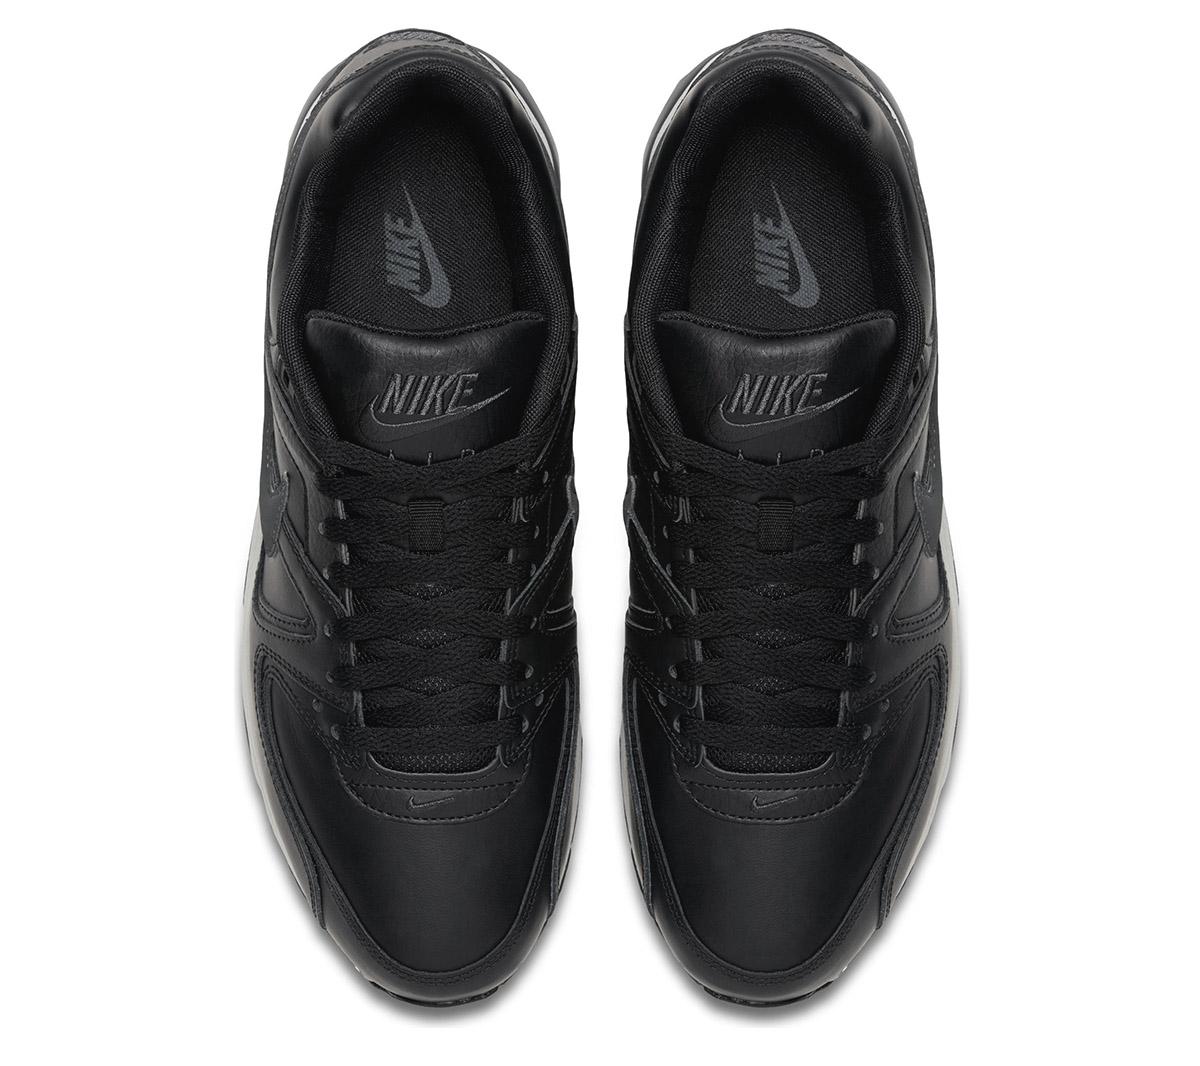 nike air max command schuhe sneaker sportschuhe turnschuhe. Black Bedroom Furniture Sets. Home Design Ideas